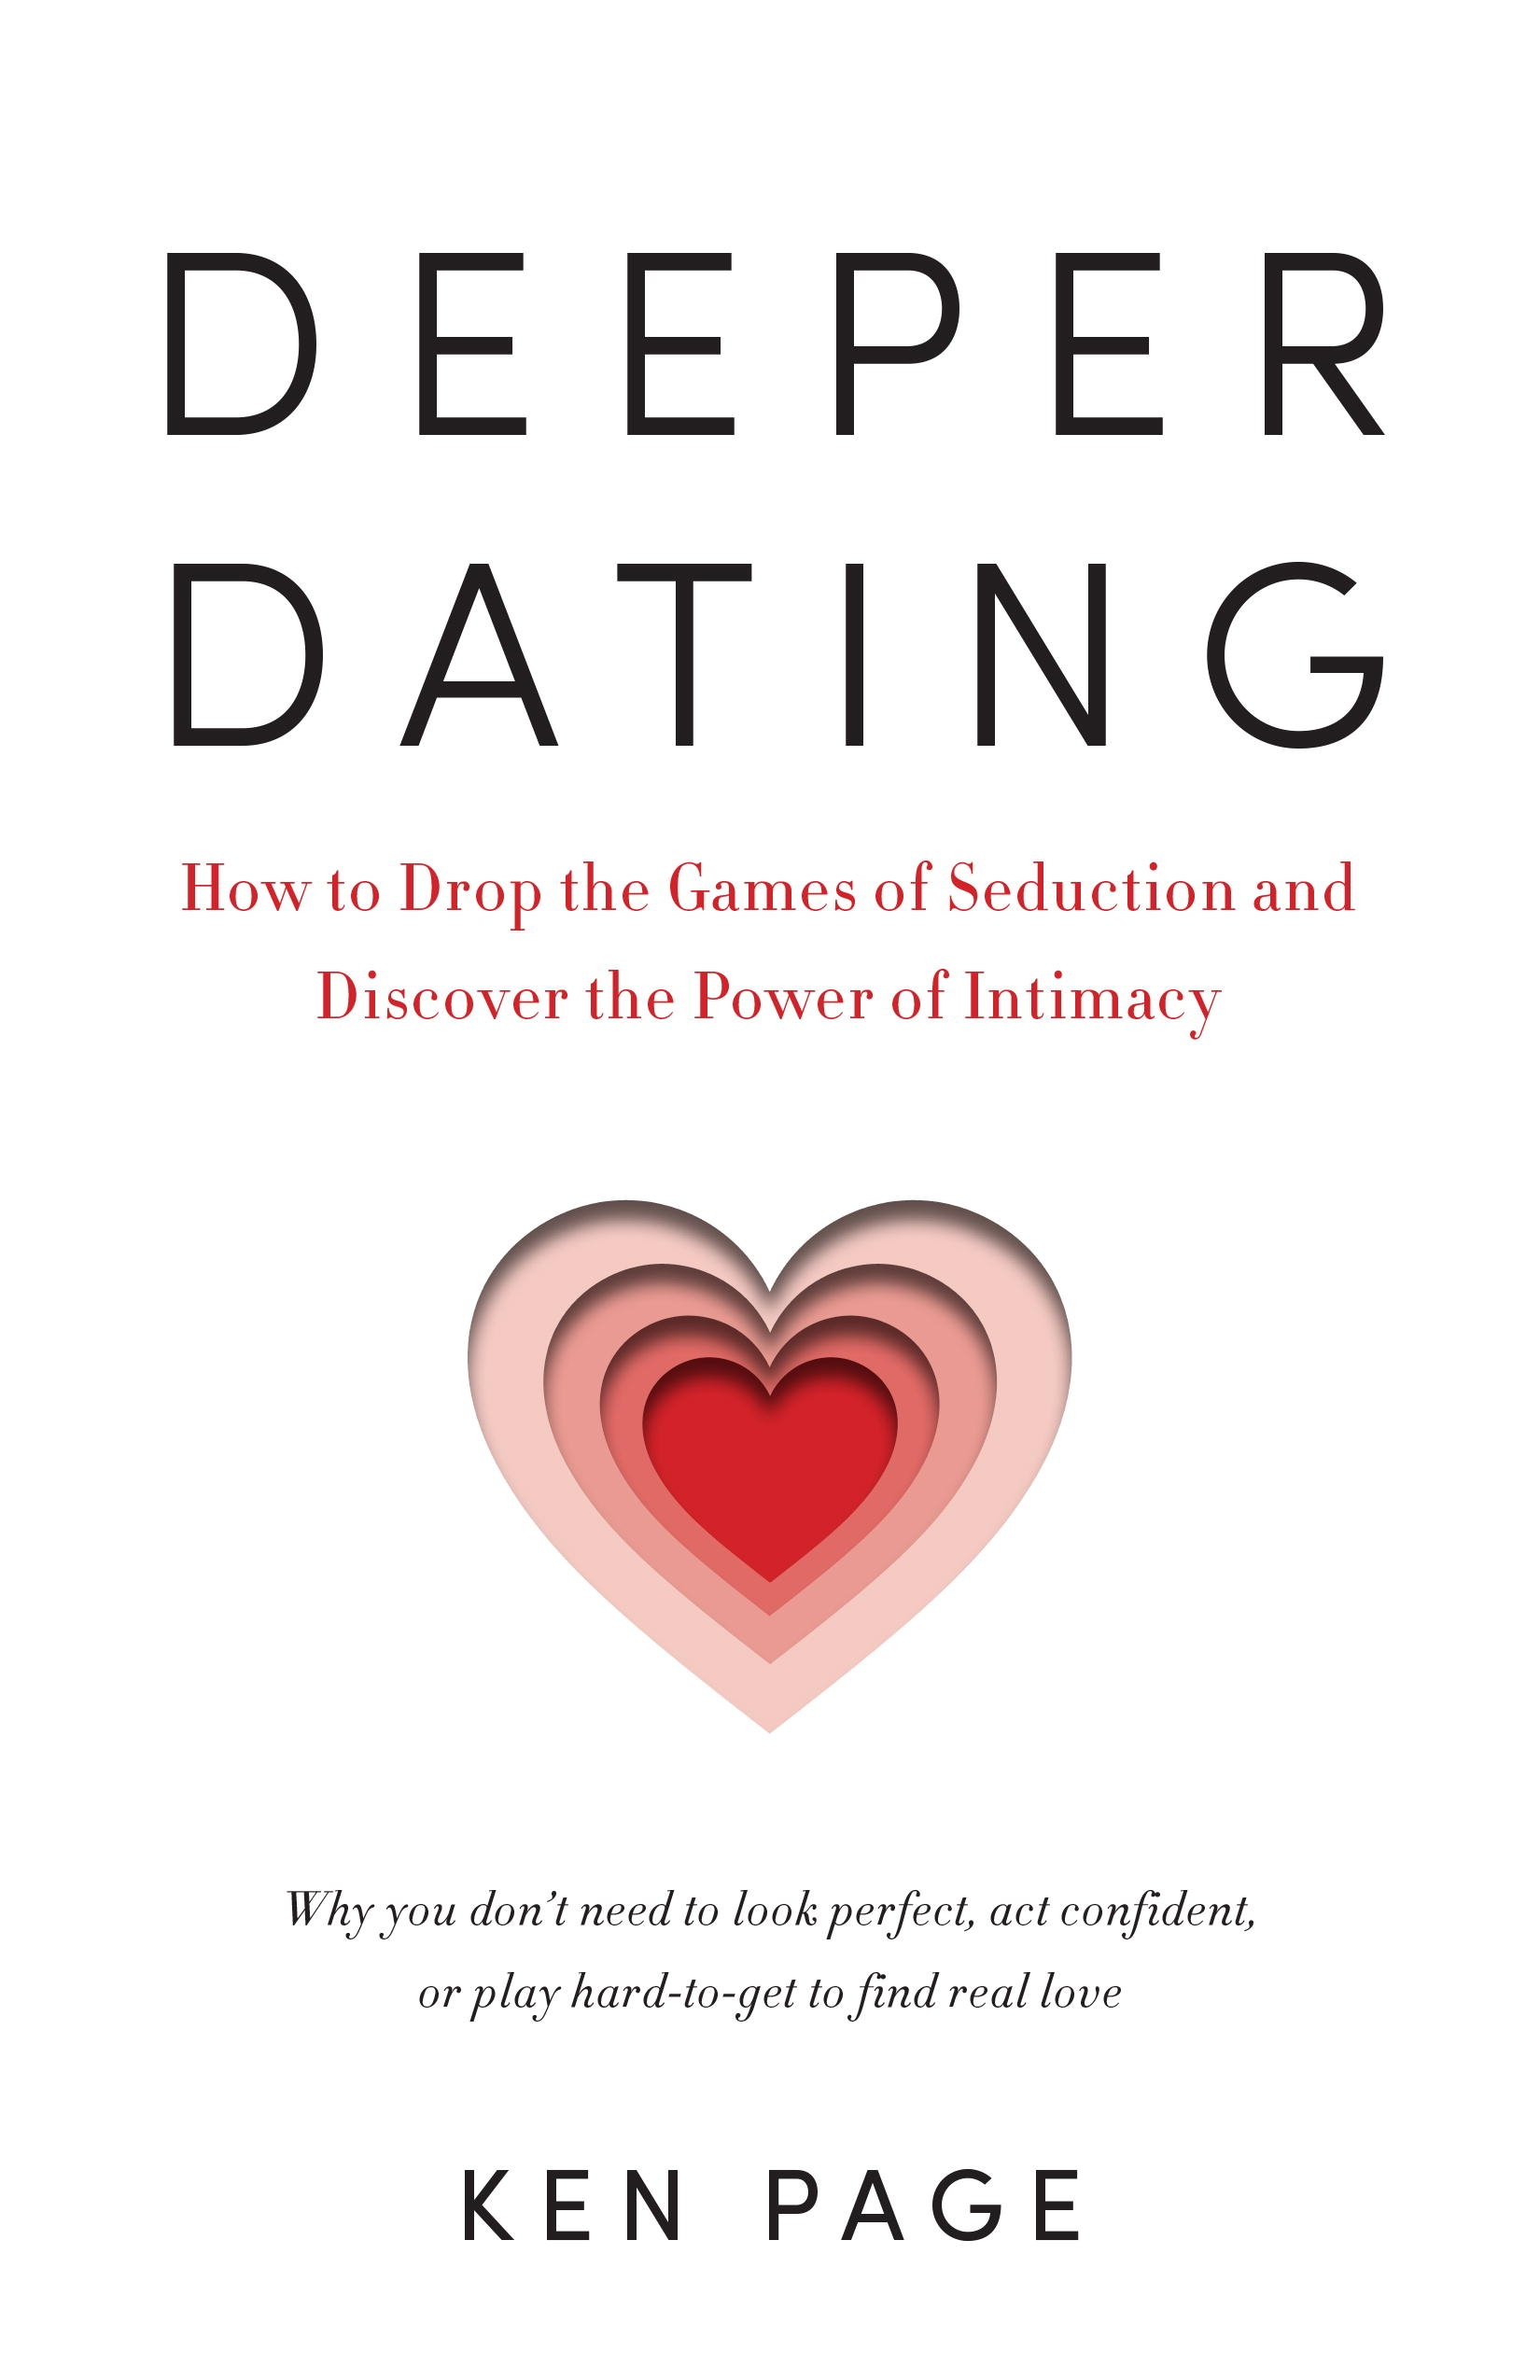 Deeper dating in Australia